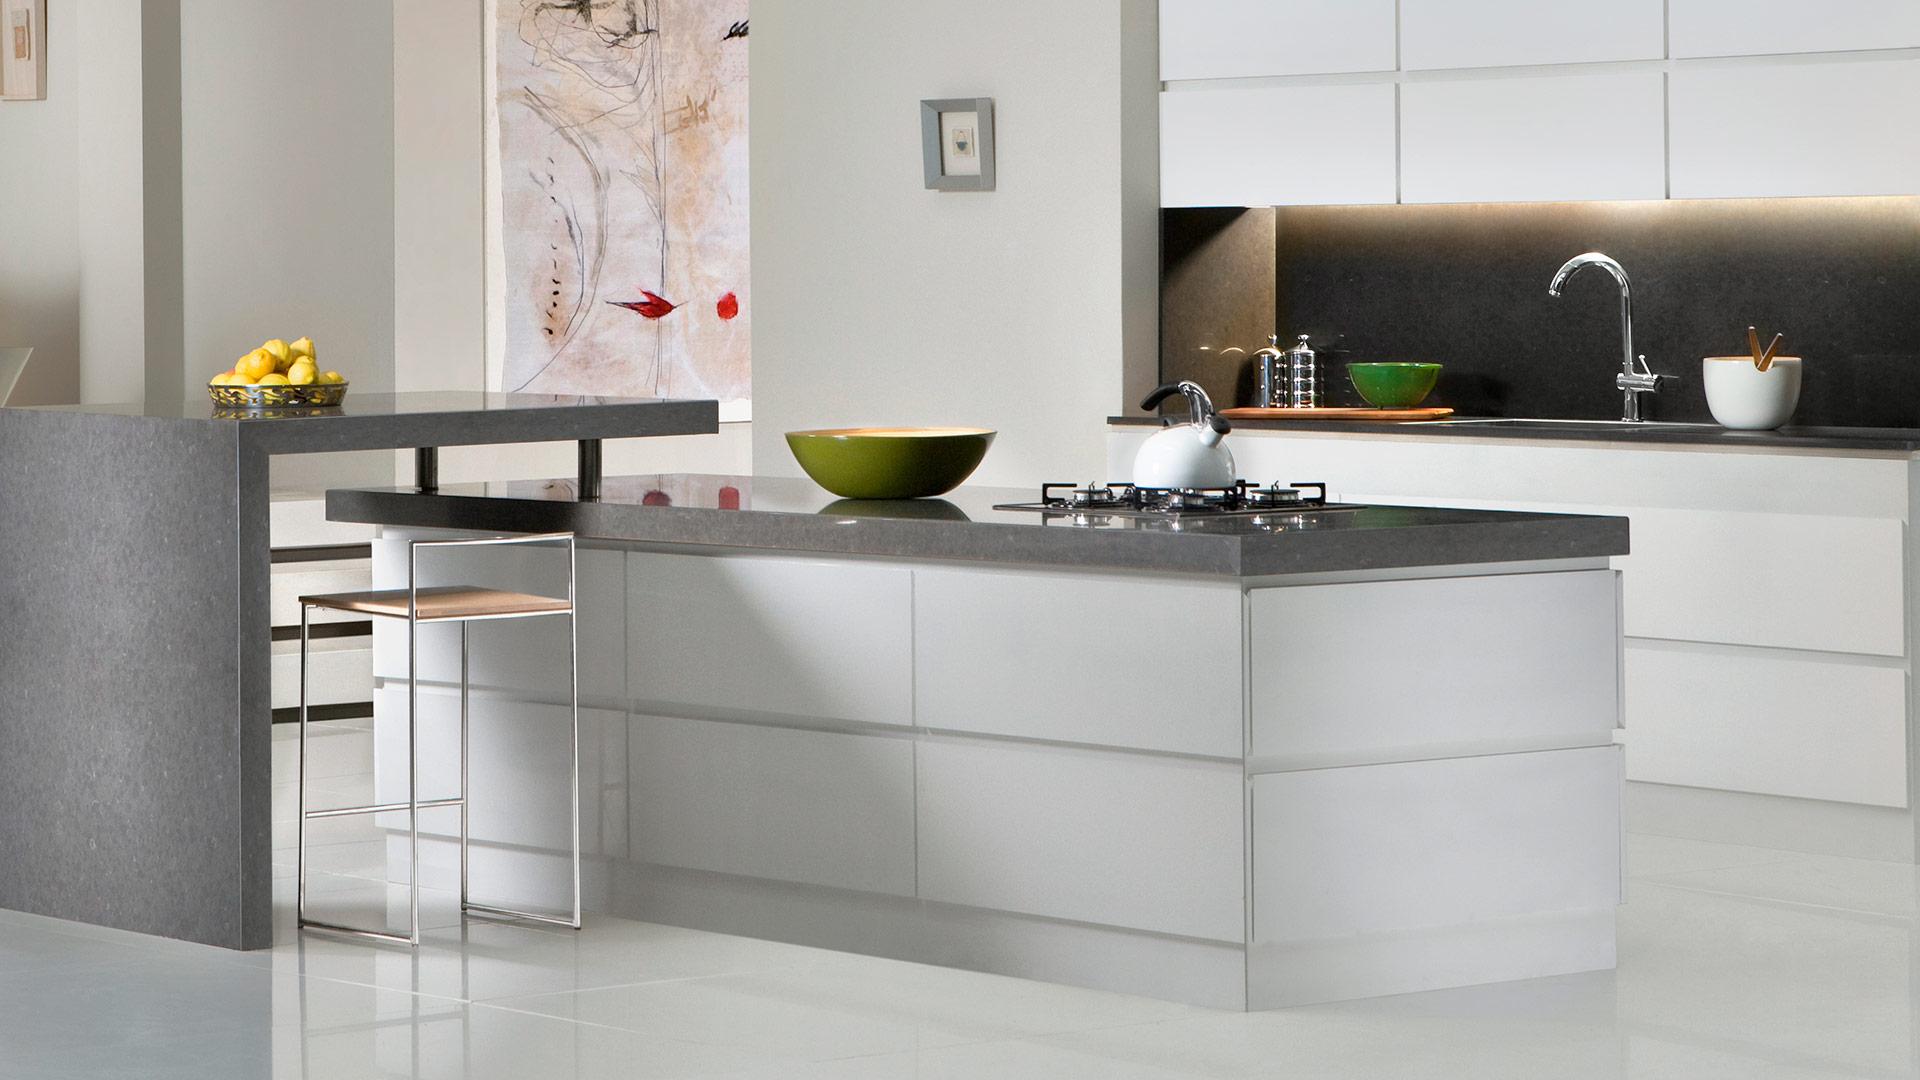 4120_Raven_kitchen_FIxed-1-1920X1080